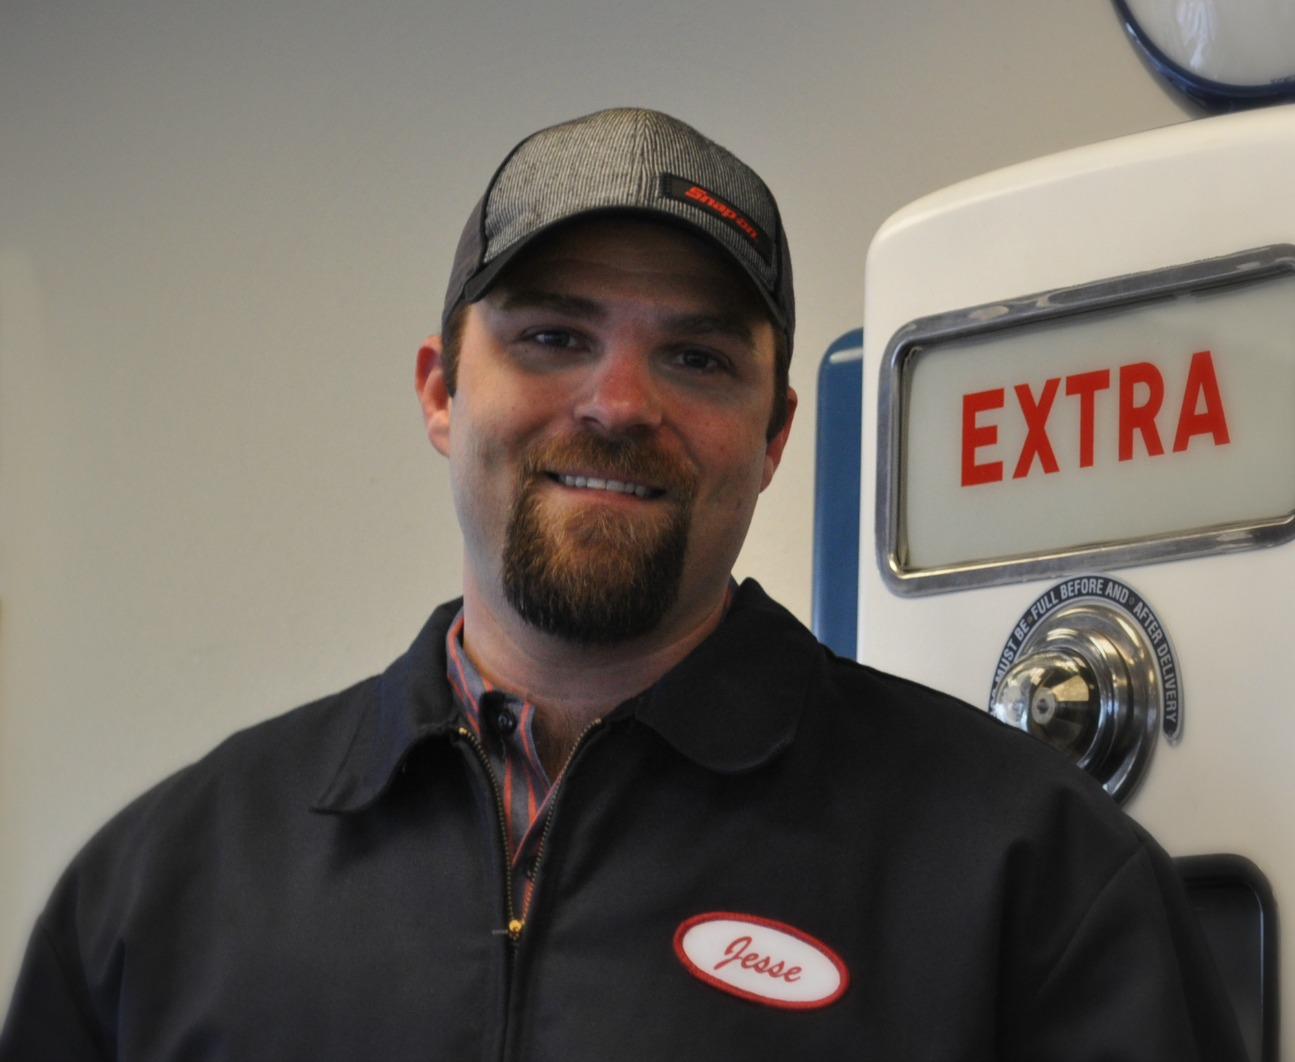 Jesse Beerman - Service Technician